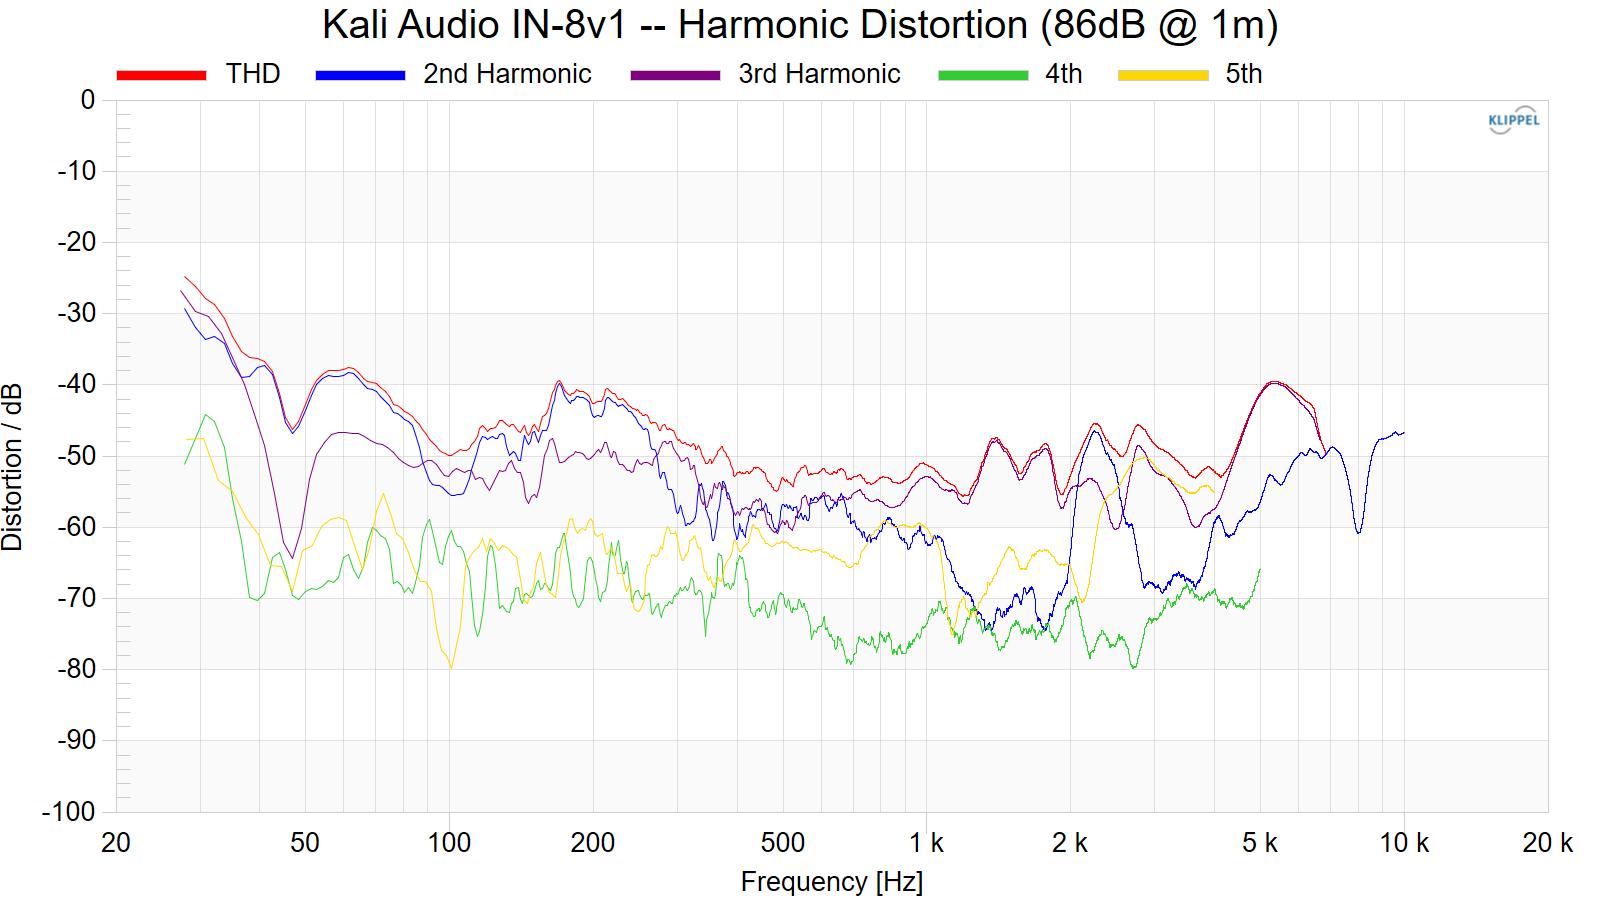 Kali%20Audio%20IN-8v1%20--%20Harmonic%20Distortion%20%2886dB%20%40%201m%29.png